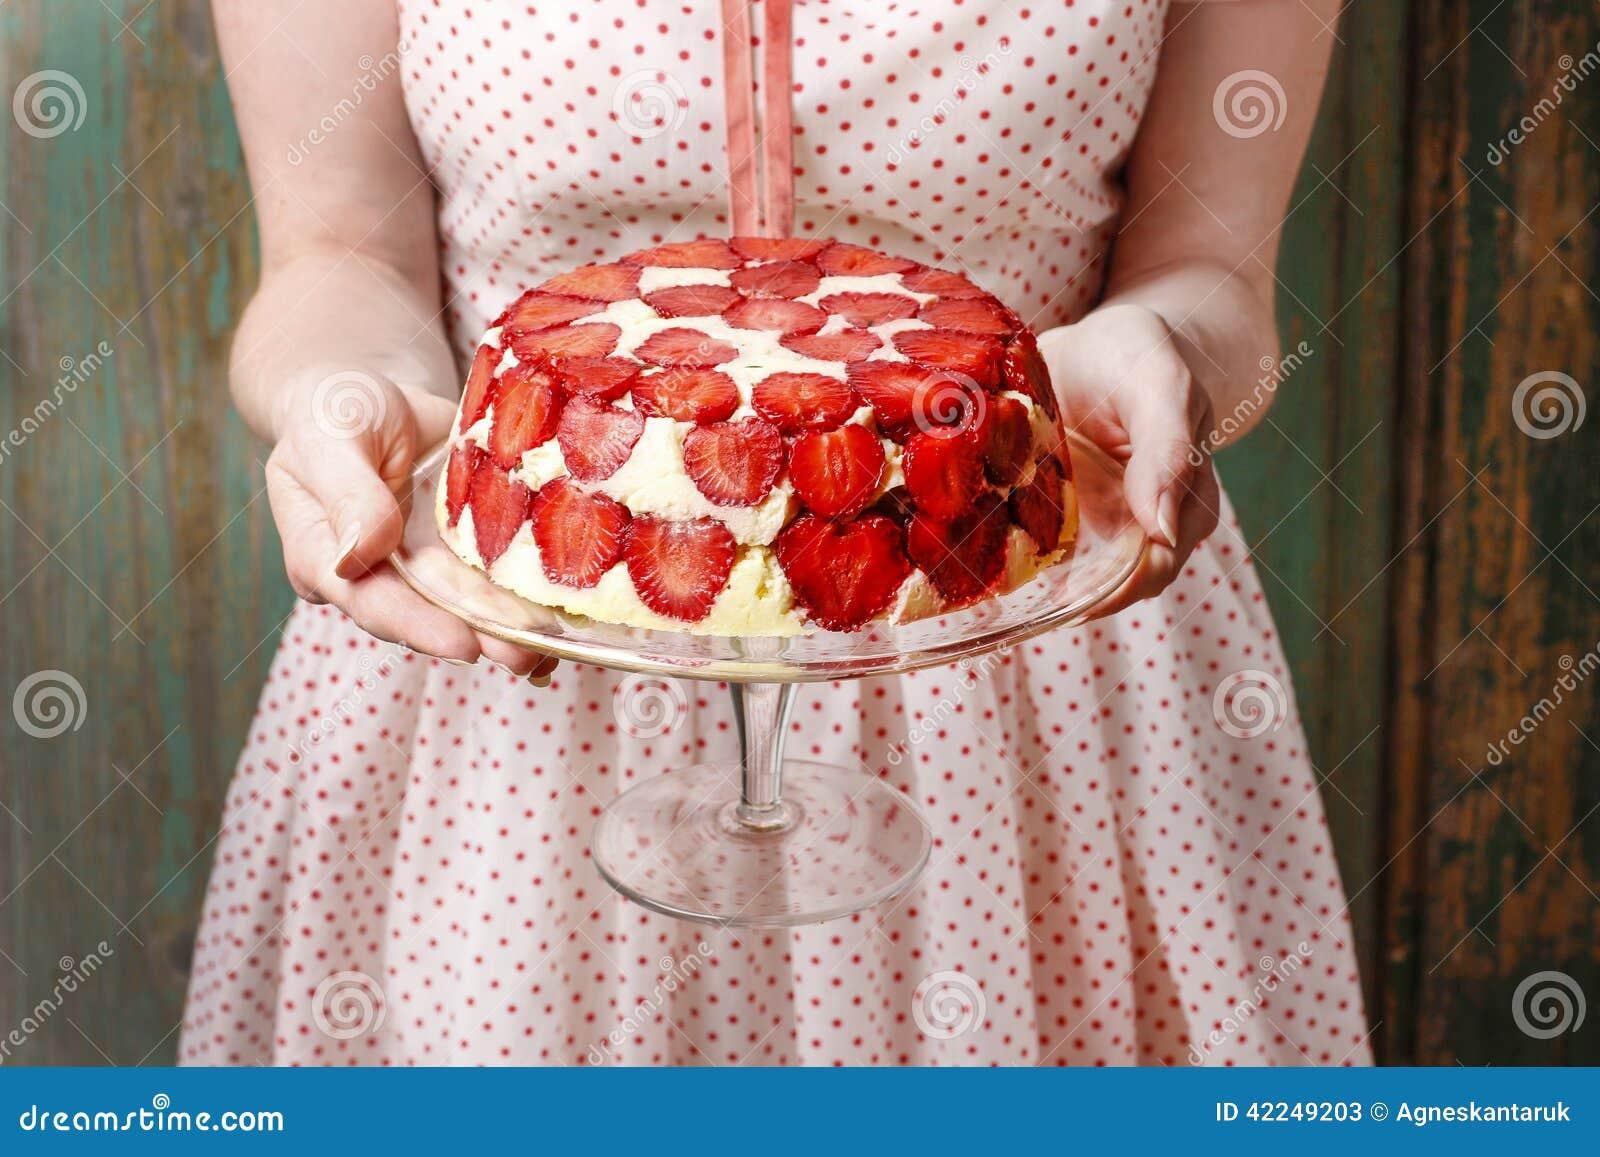 Strawberry Cake Stand